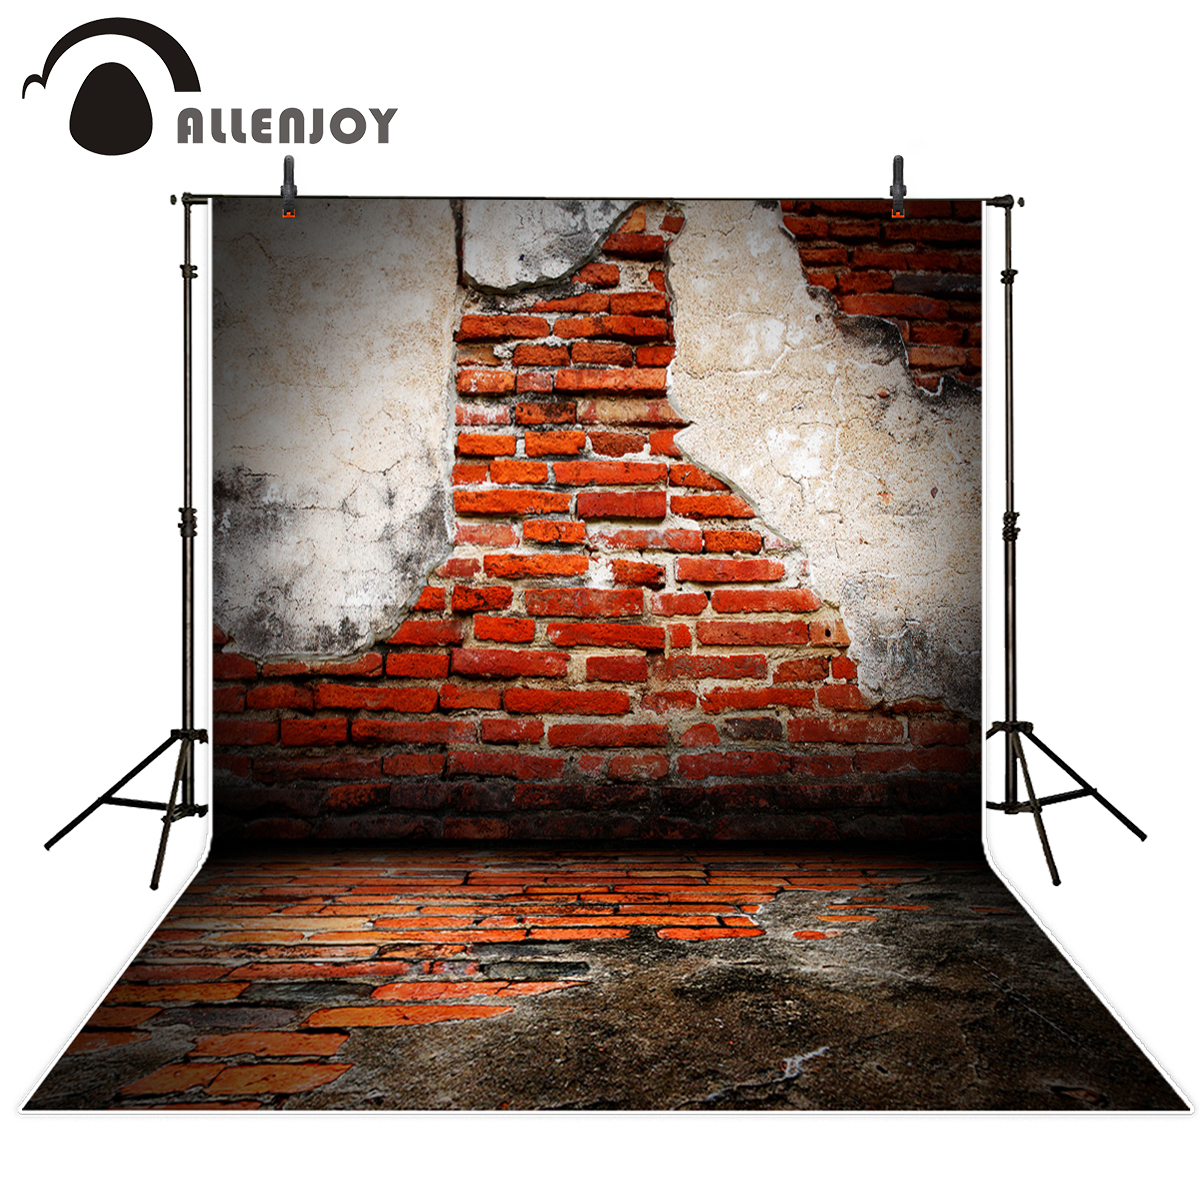 Allenjoy photography background shabby brick wall and floor  photo backgrounds for photos background photography backdrop vinyl